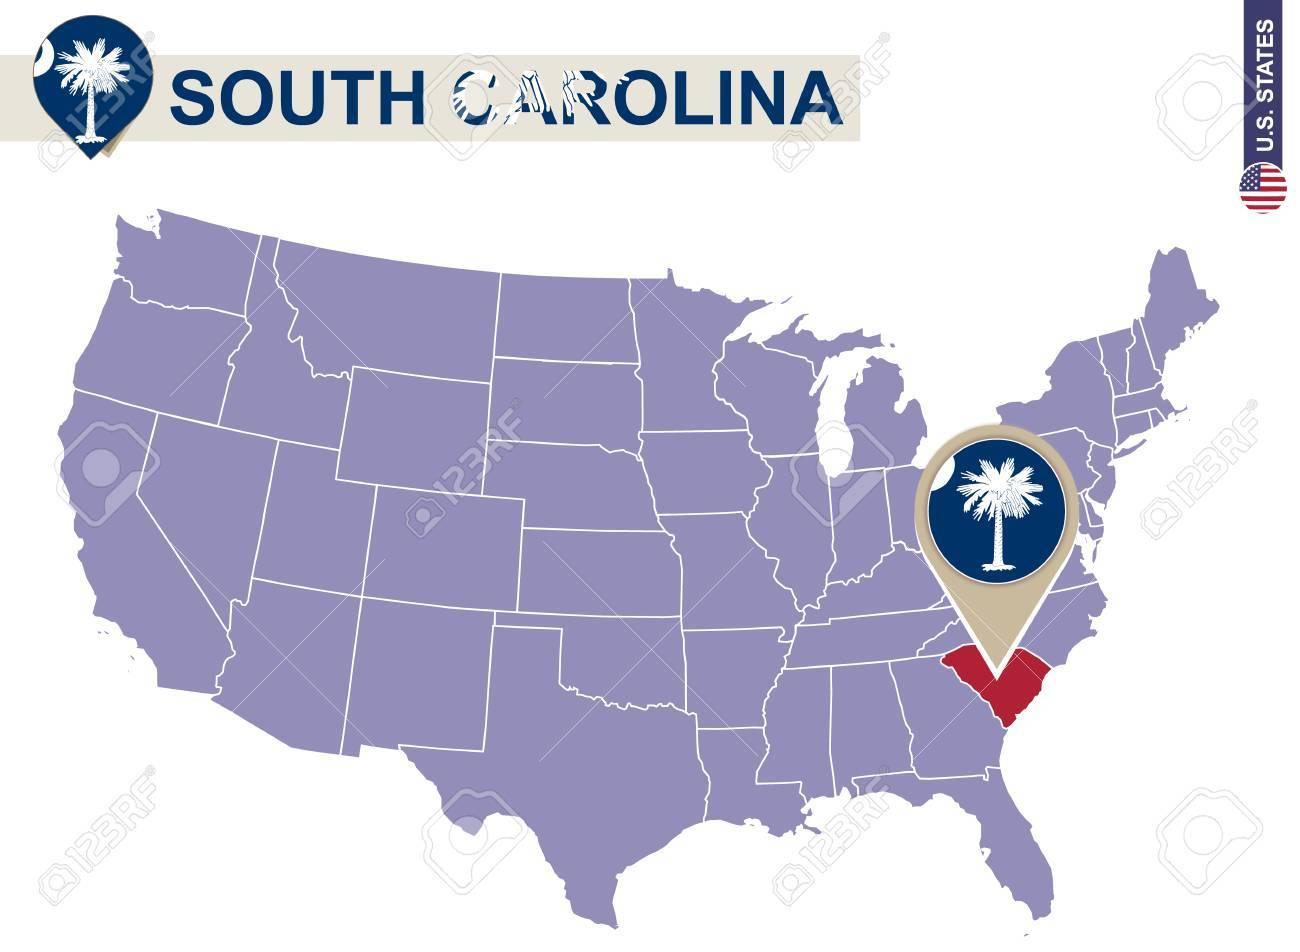 South Carolina State On USA Map South Carolina Flag And Map